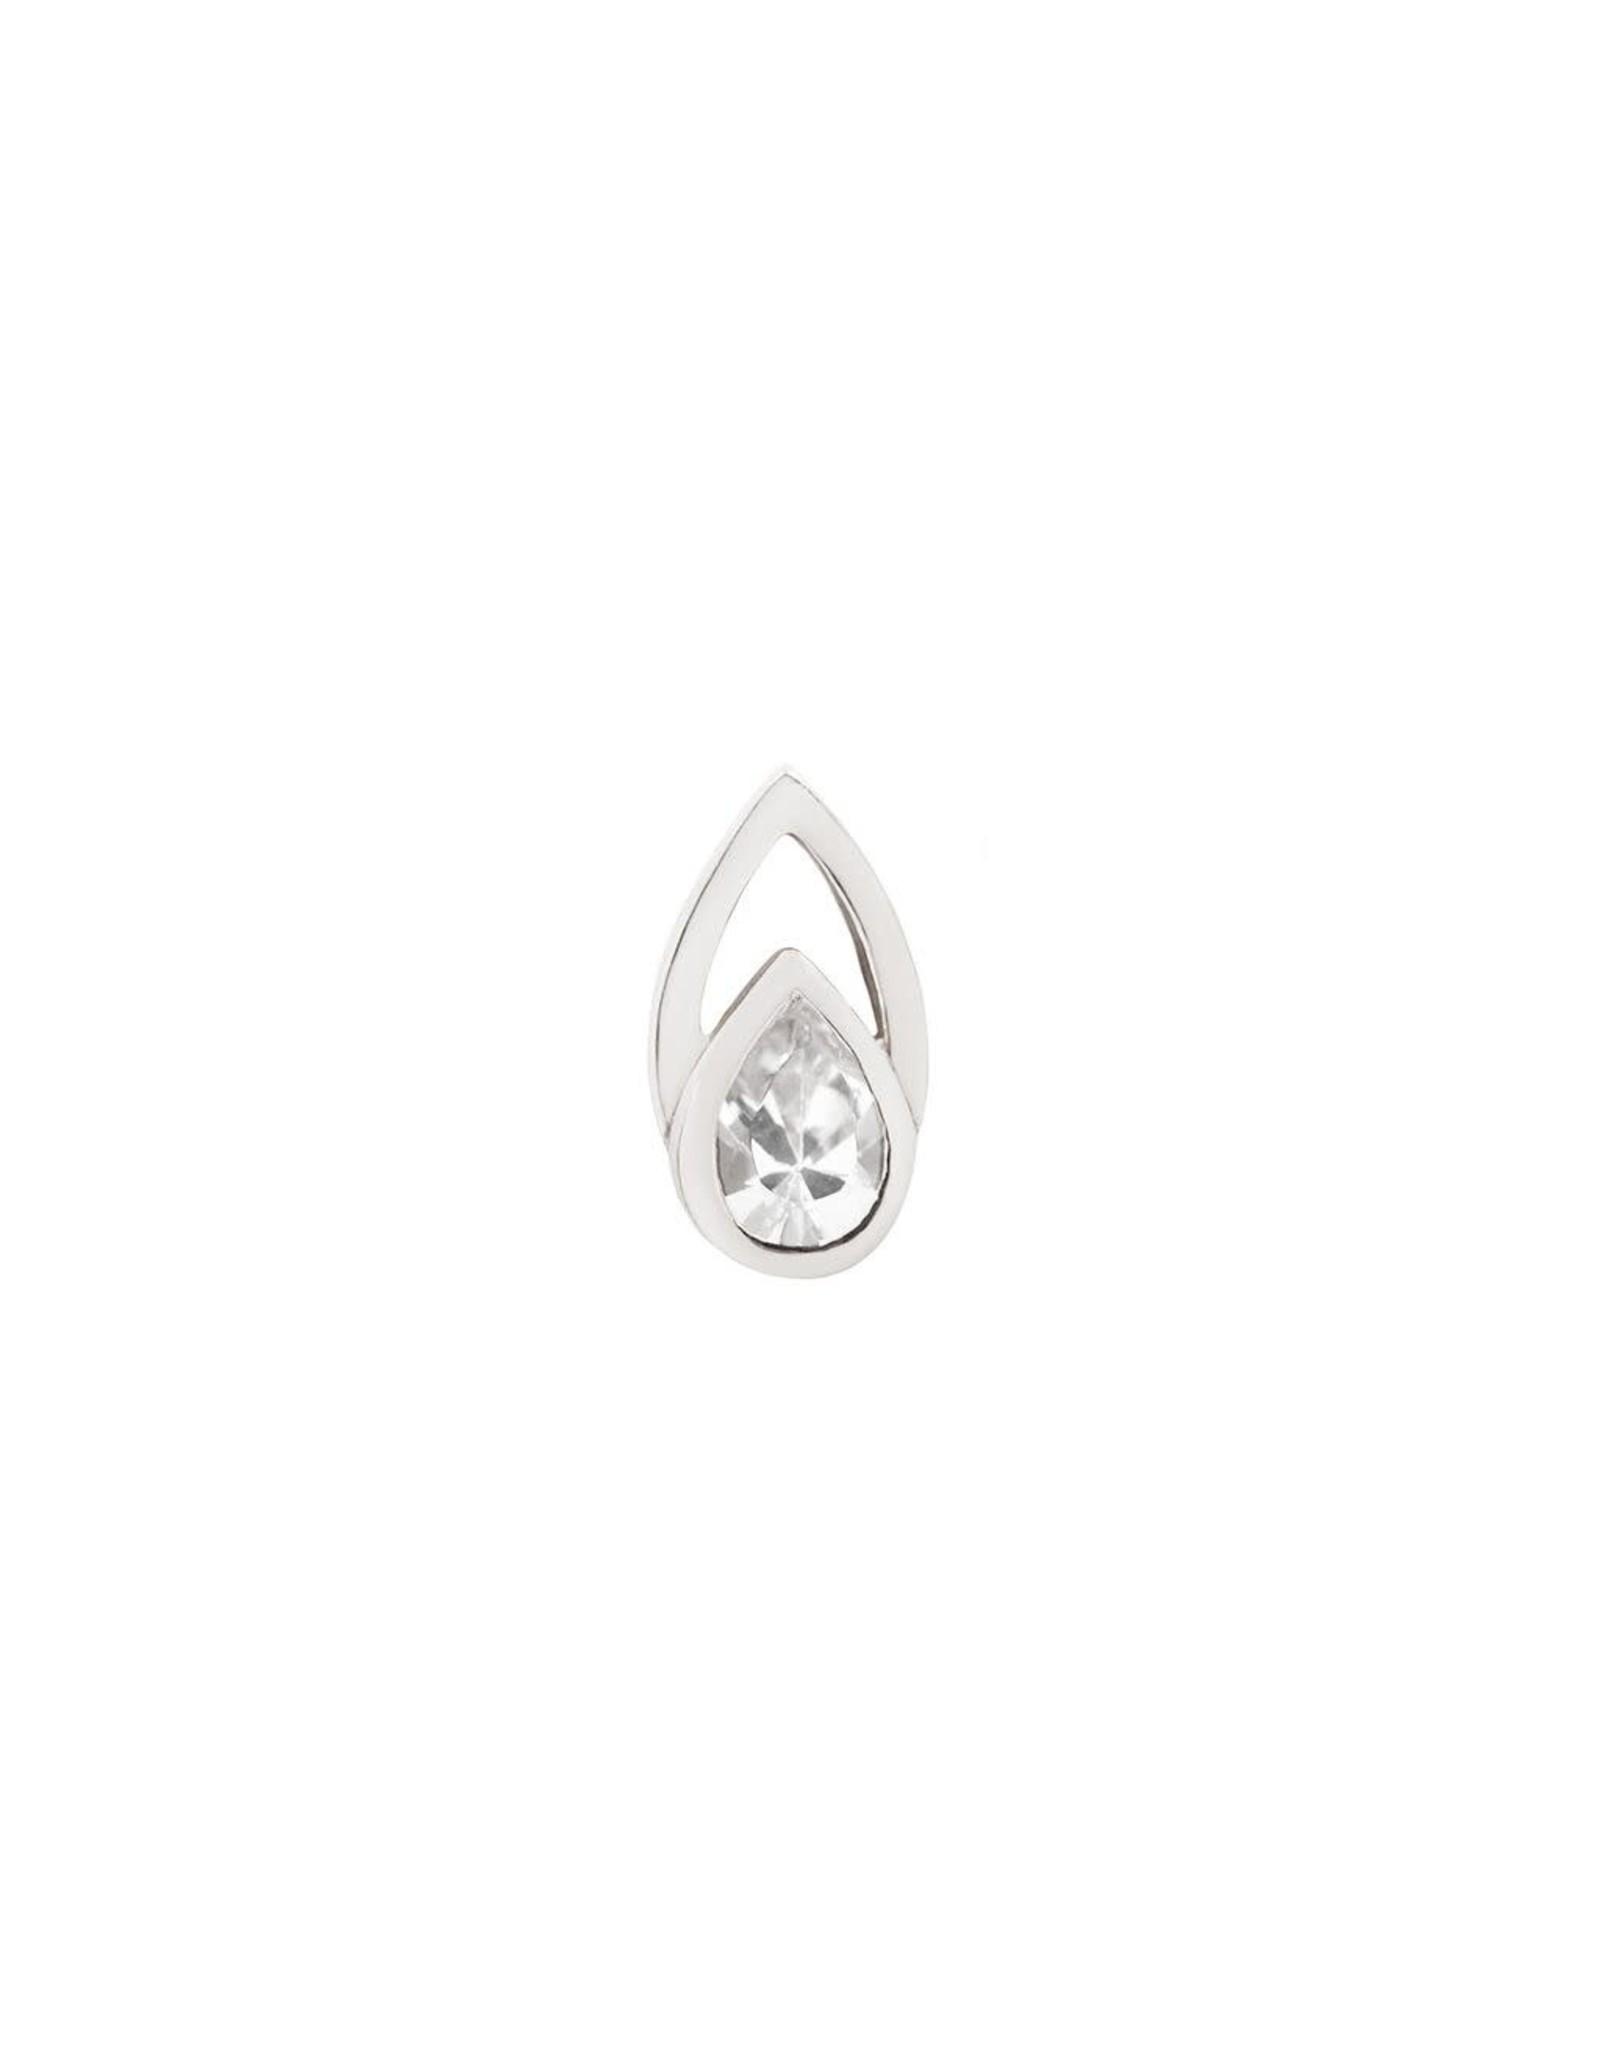 "Buddha Jewelry Organics Buddha Jewelry Organics ""Echo"" press fit end with pear-cut CZ"